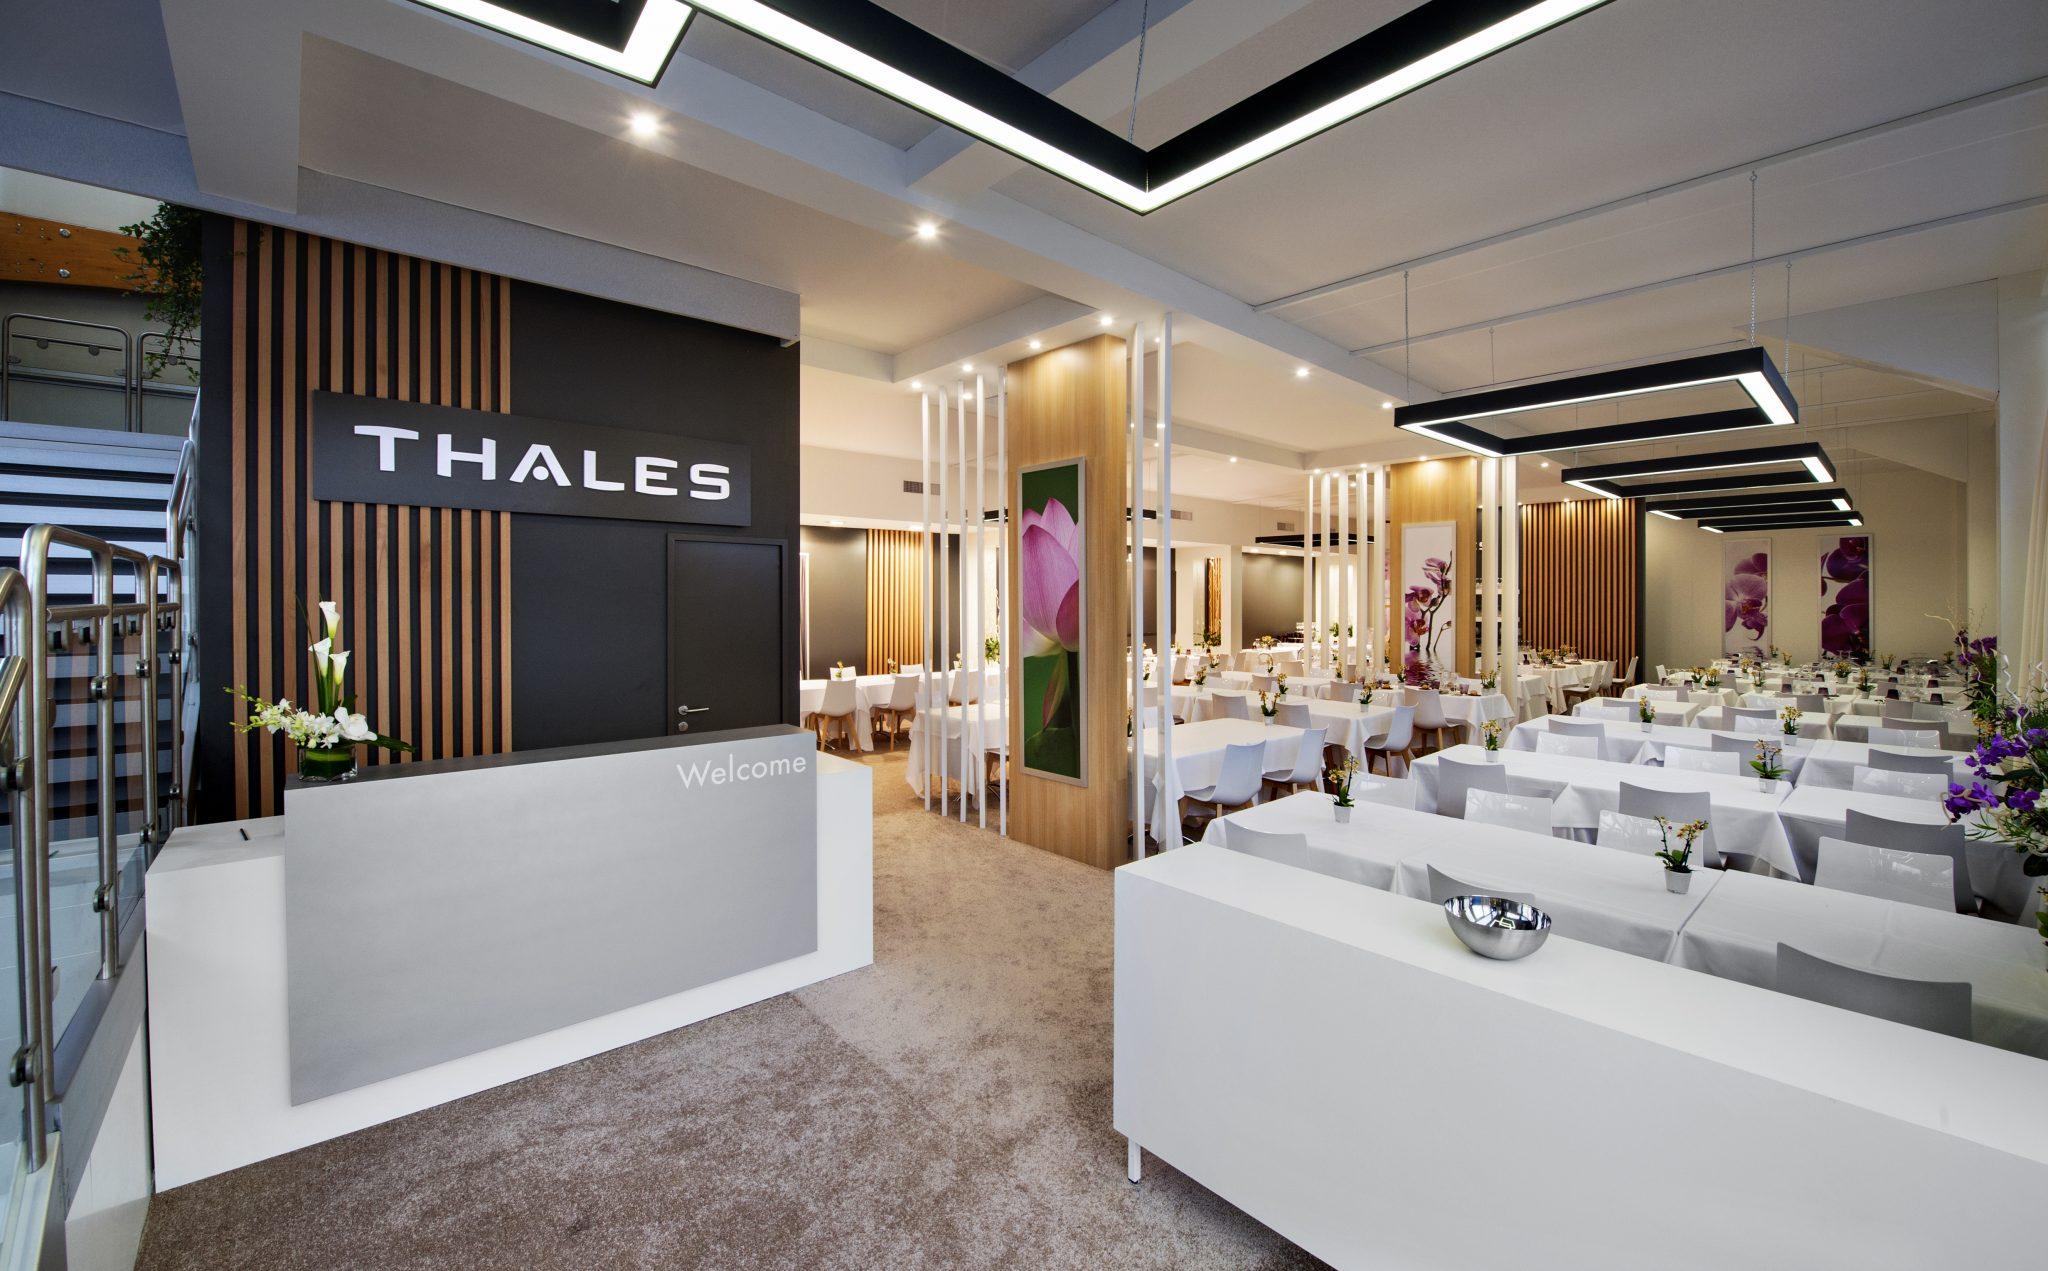 Stand Thales - 1610 m² + mezzanine 125 m² - Salon Eurosatory ...